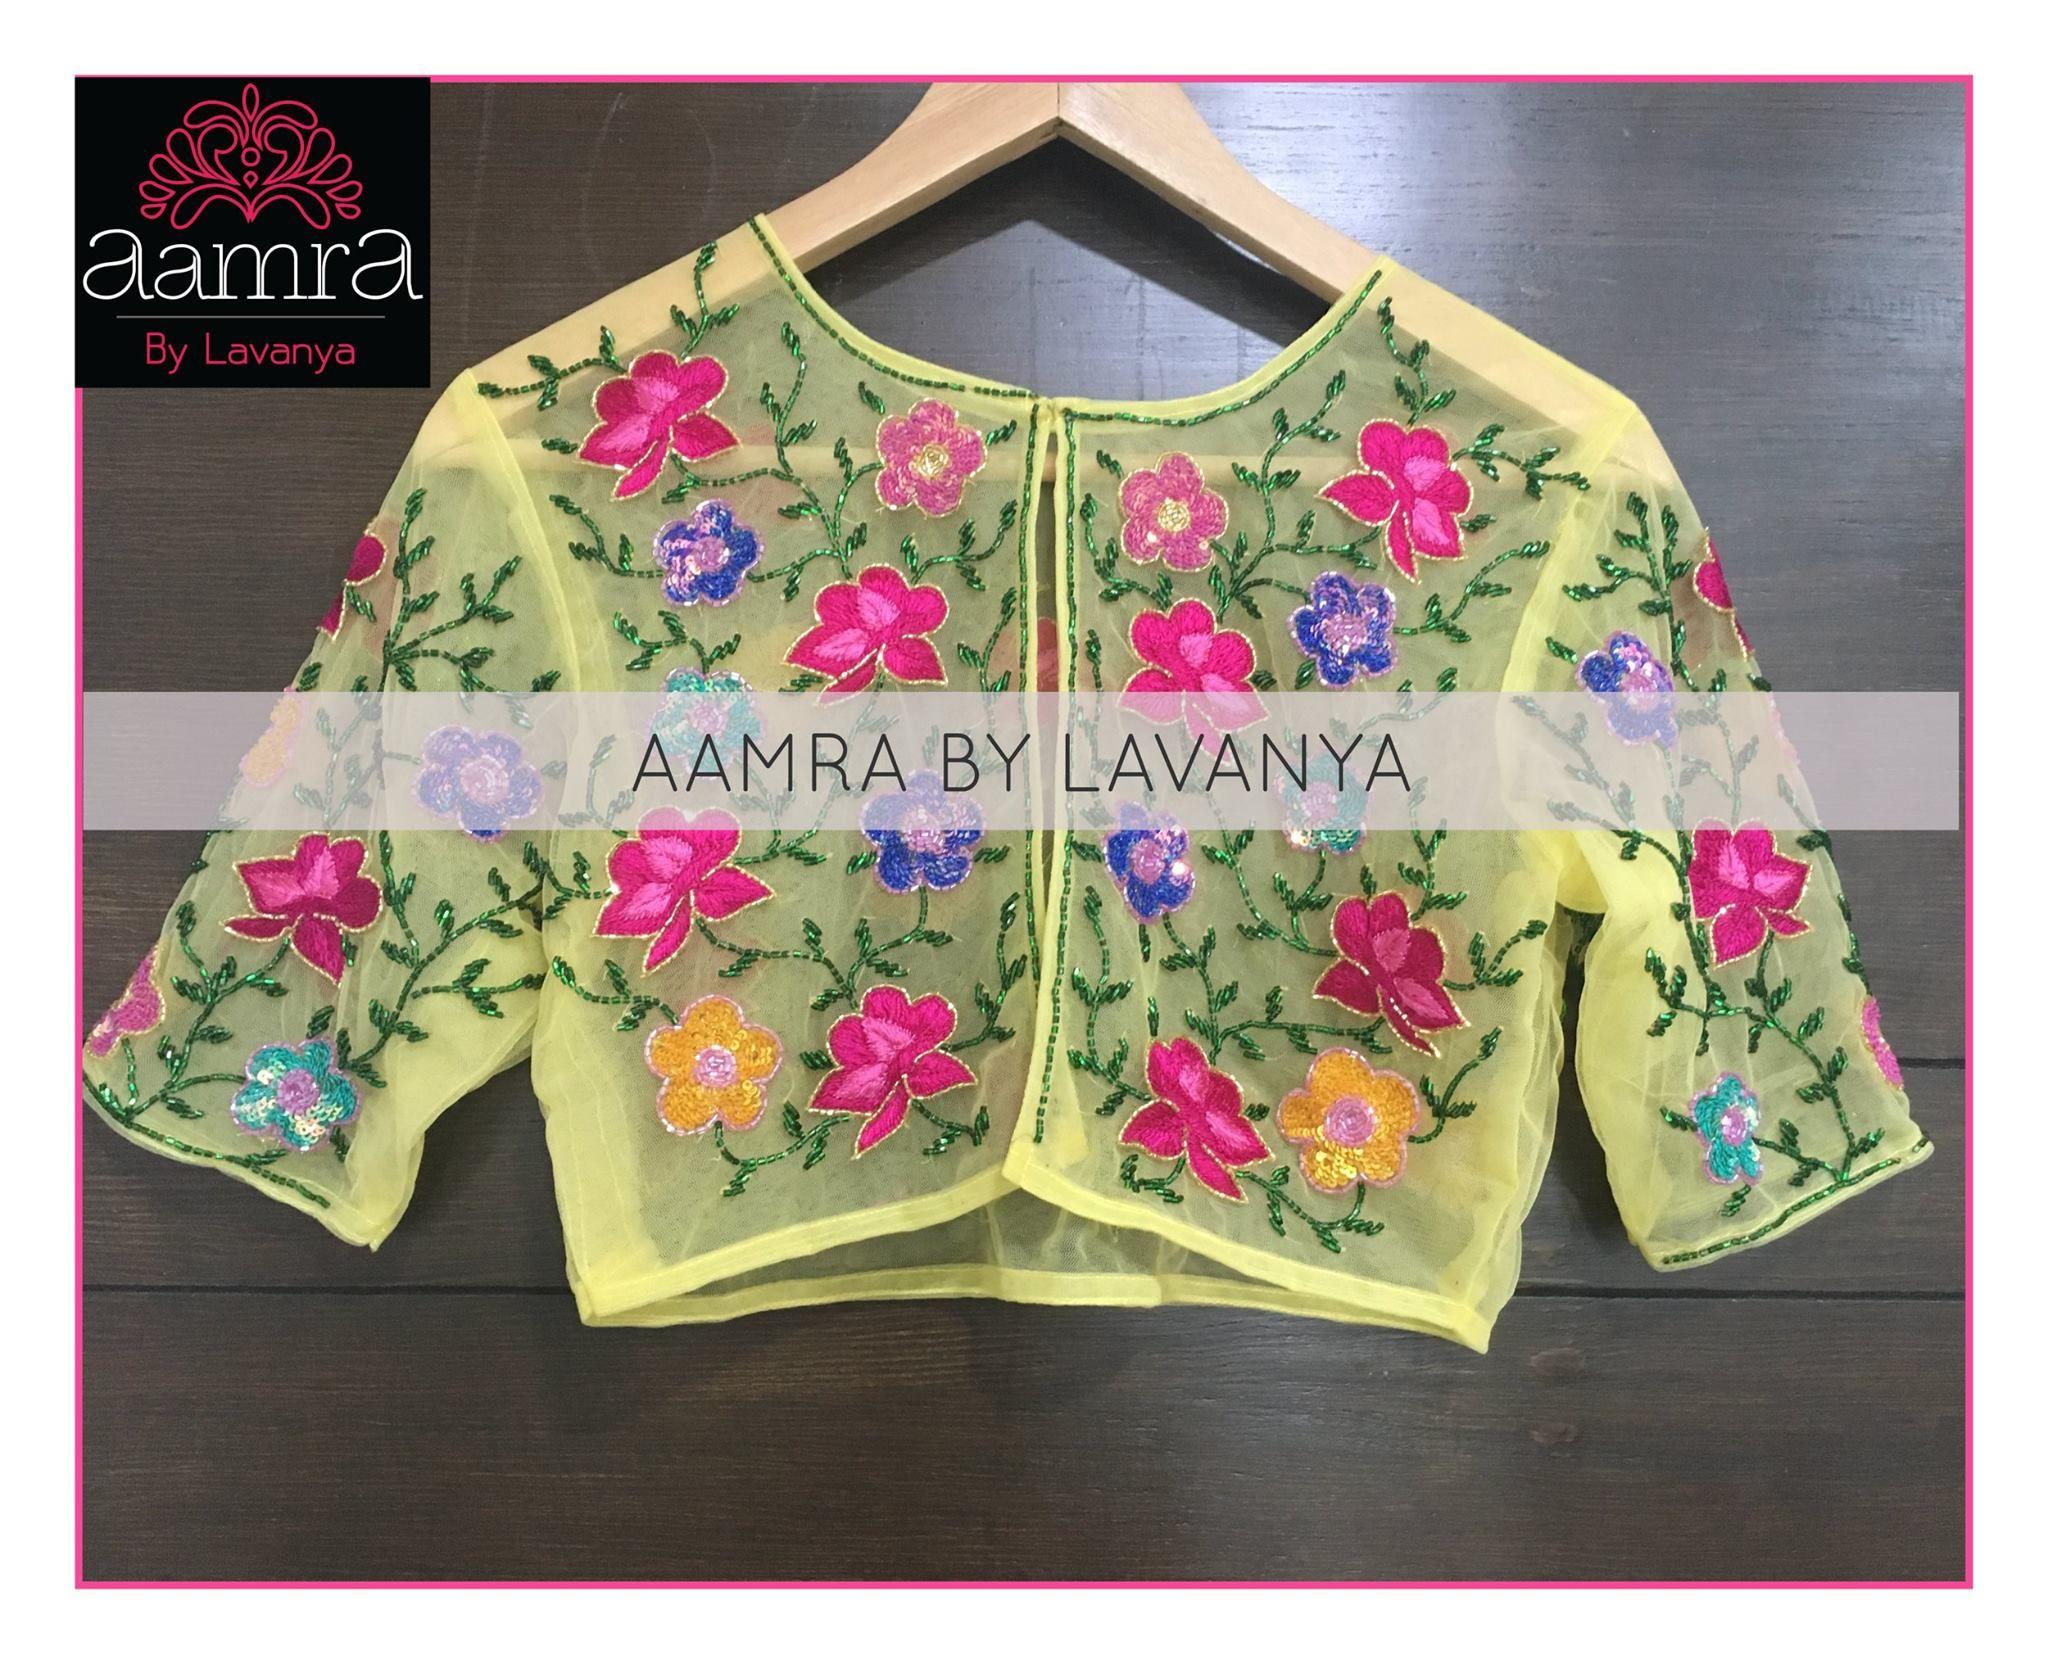 Aamra By Lavanya. <br> Contact : 9177363970. <br> Email : aamrabylavanya@gmail.com.